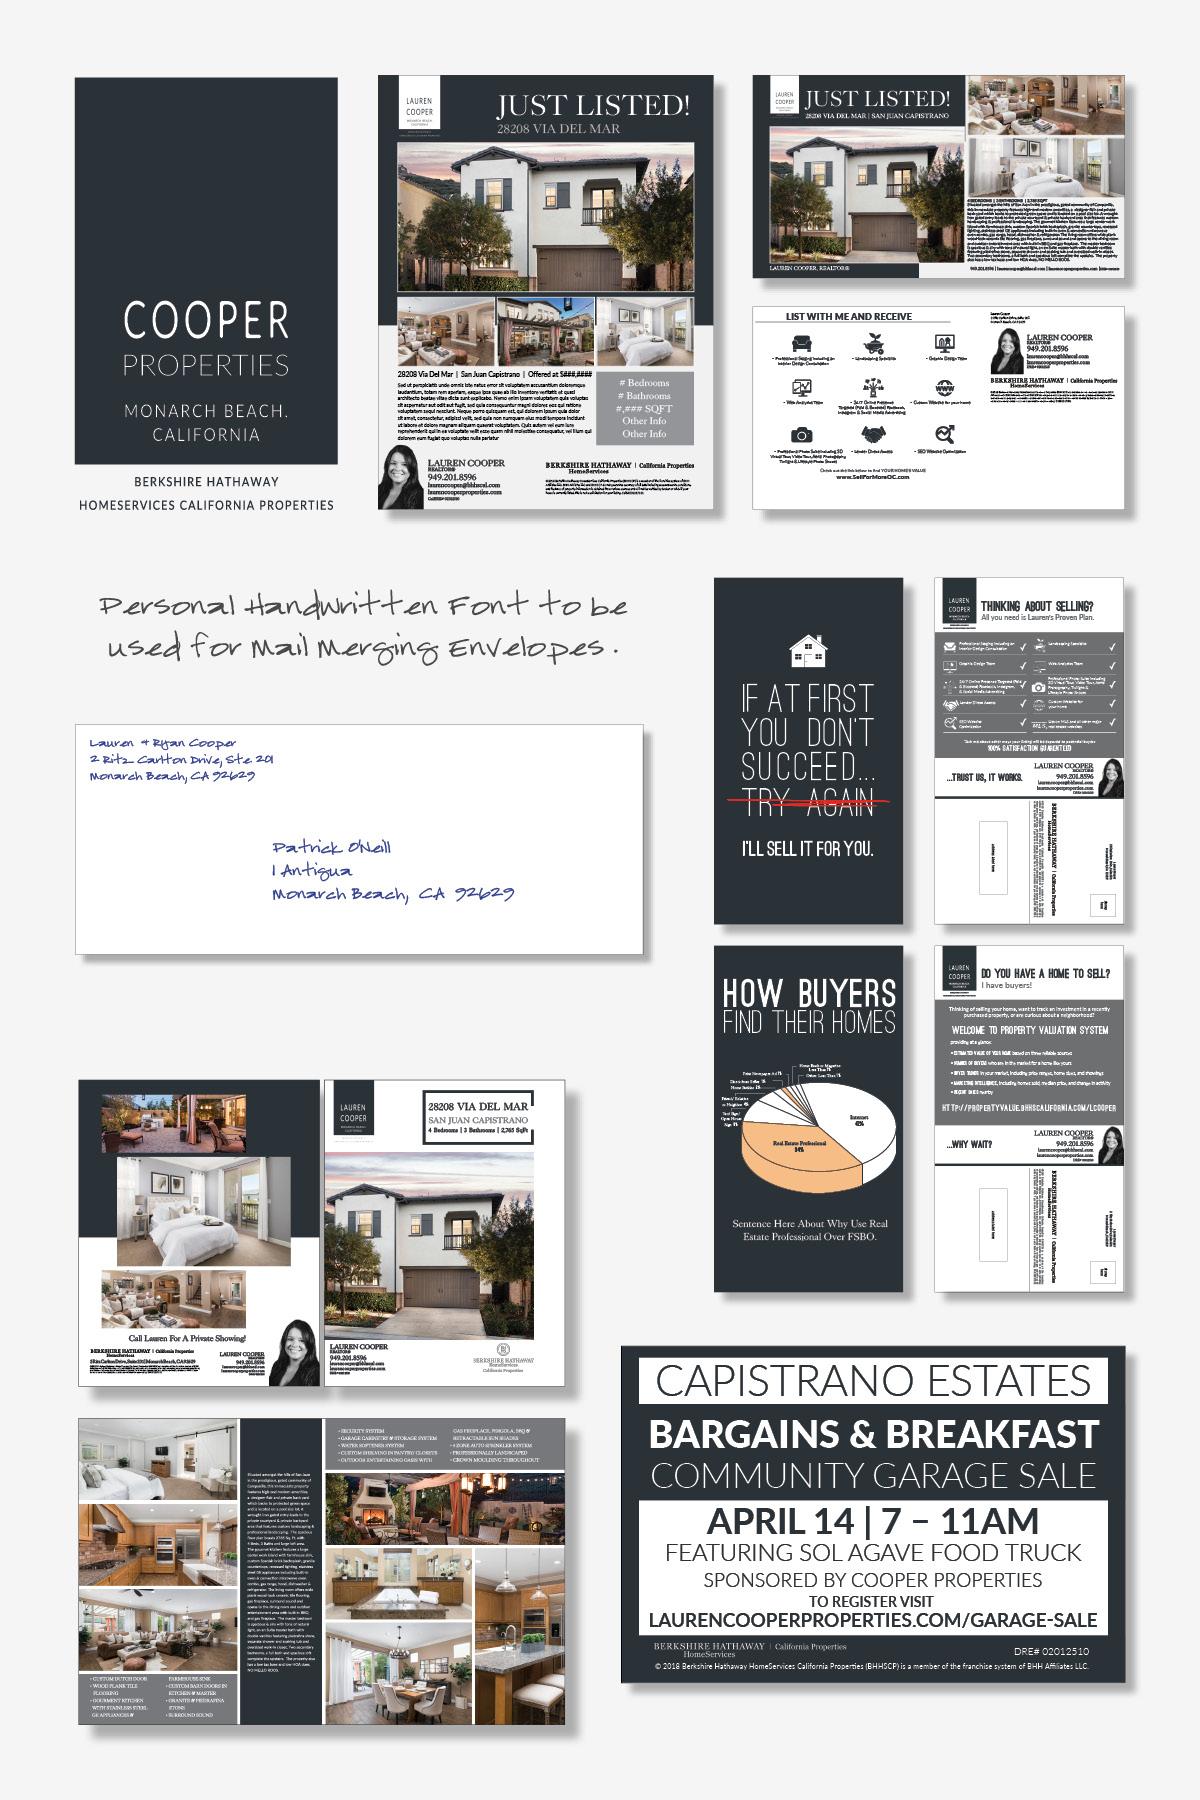 COOPER PROPERTIES   This brand was developed for Lauren and Ryan Cooper, REALTORS® located in Orange County.